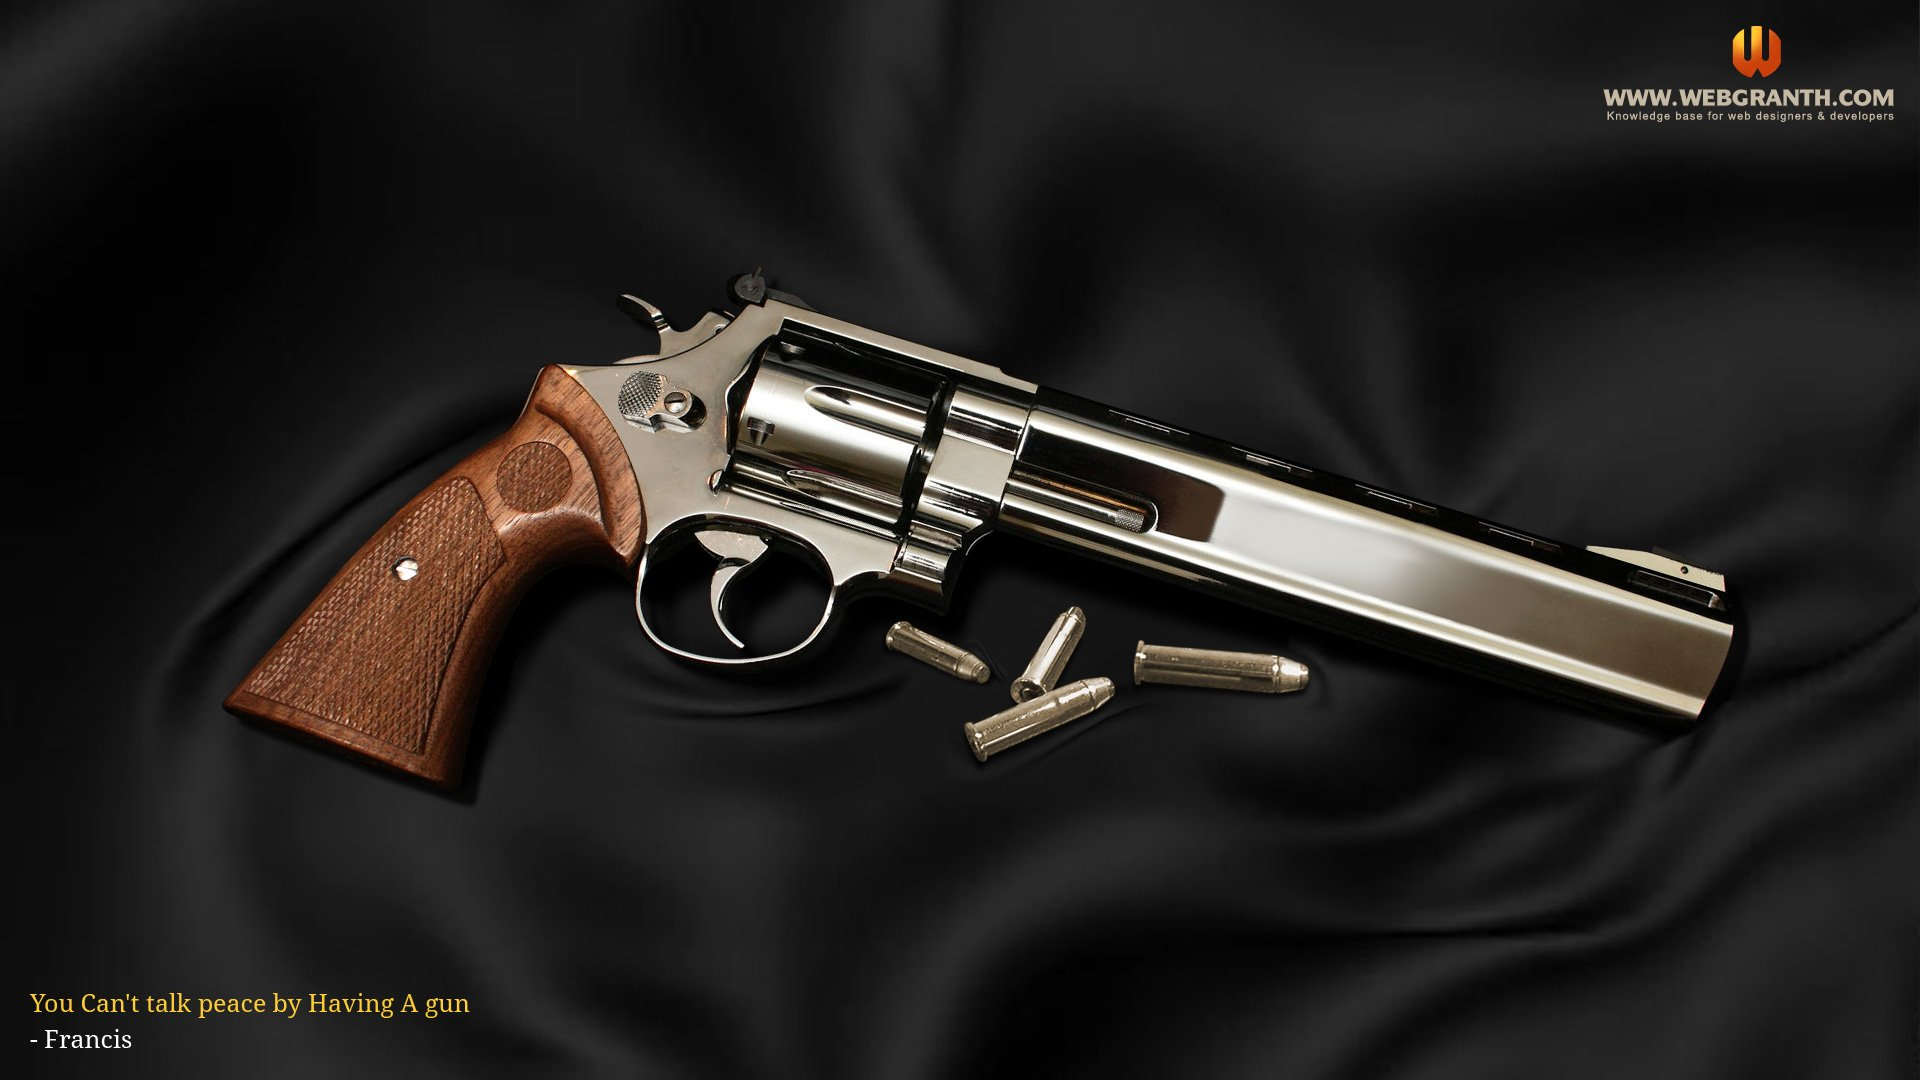 guns wallpaper weapons desktop | www.topsimages